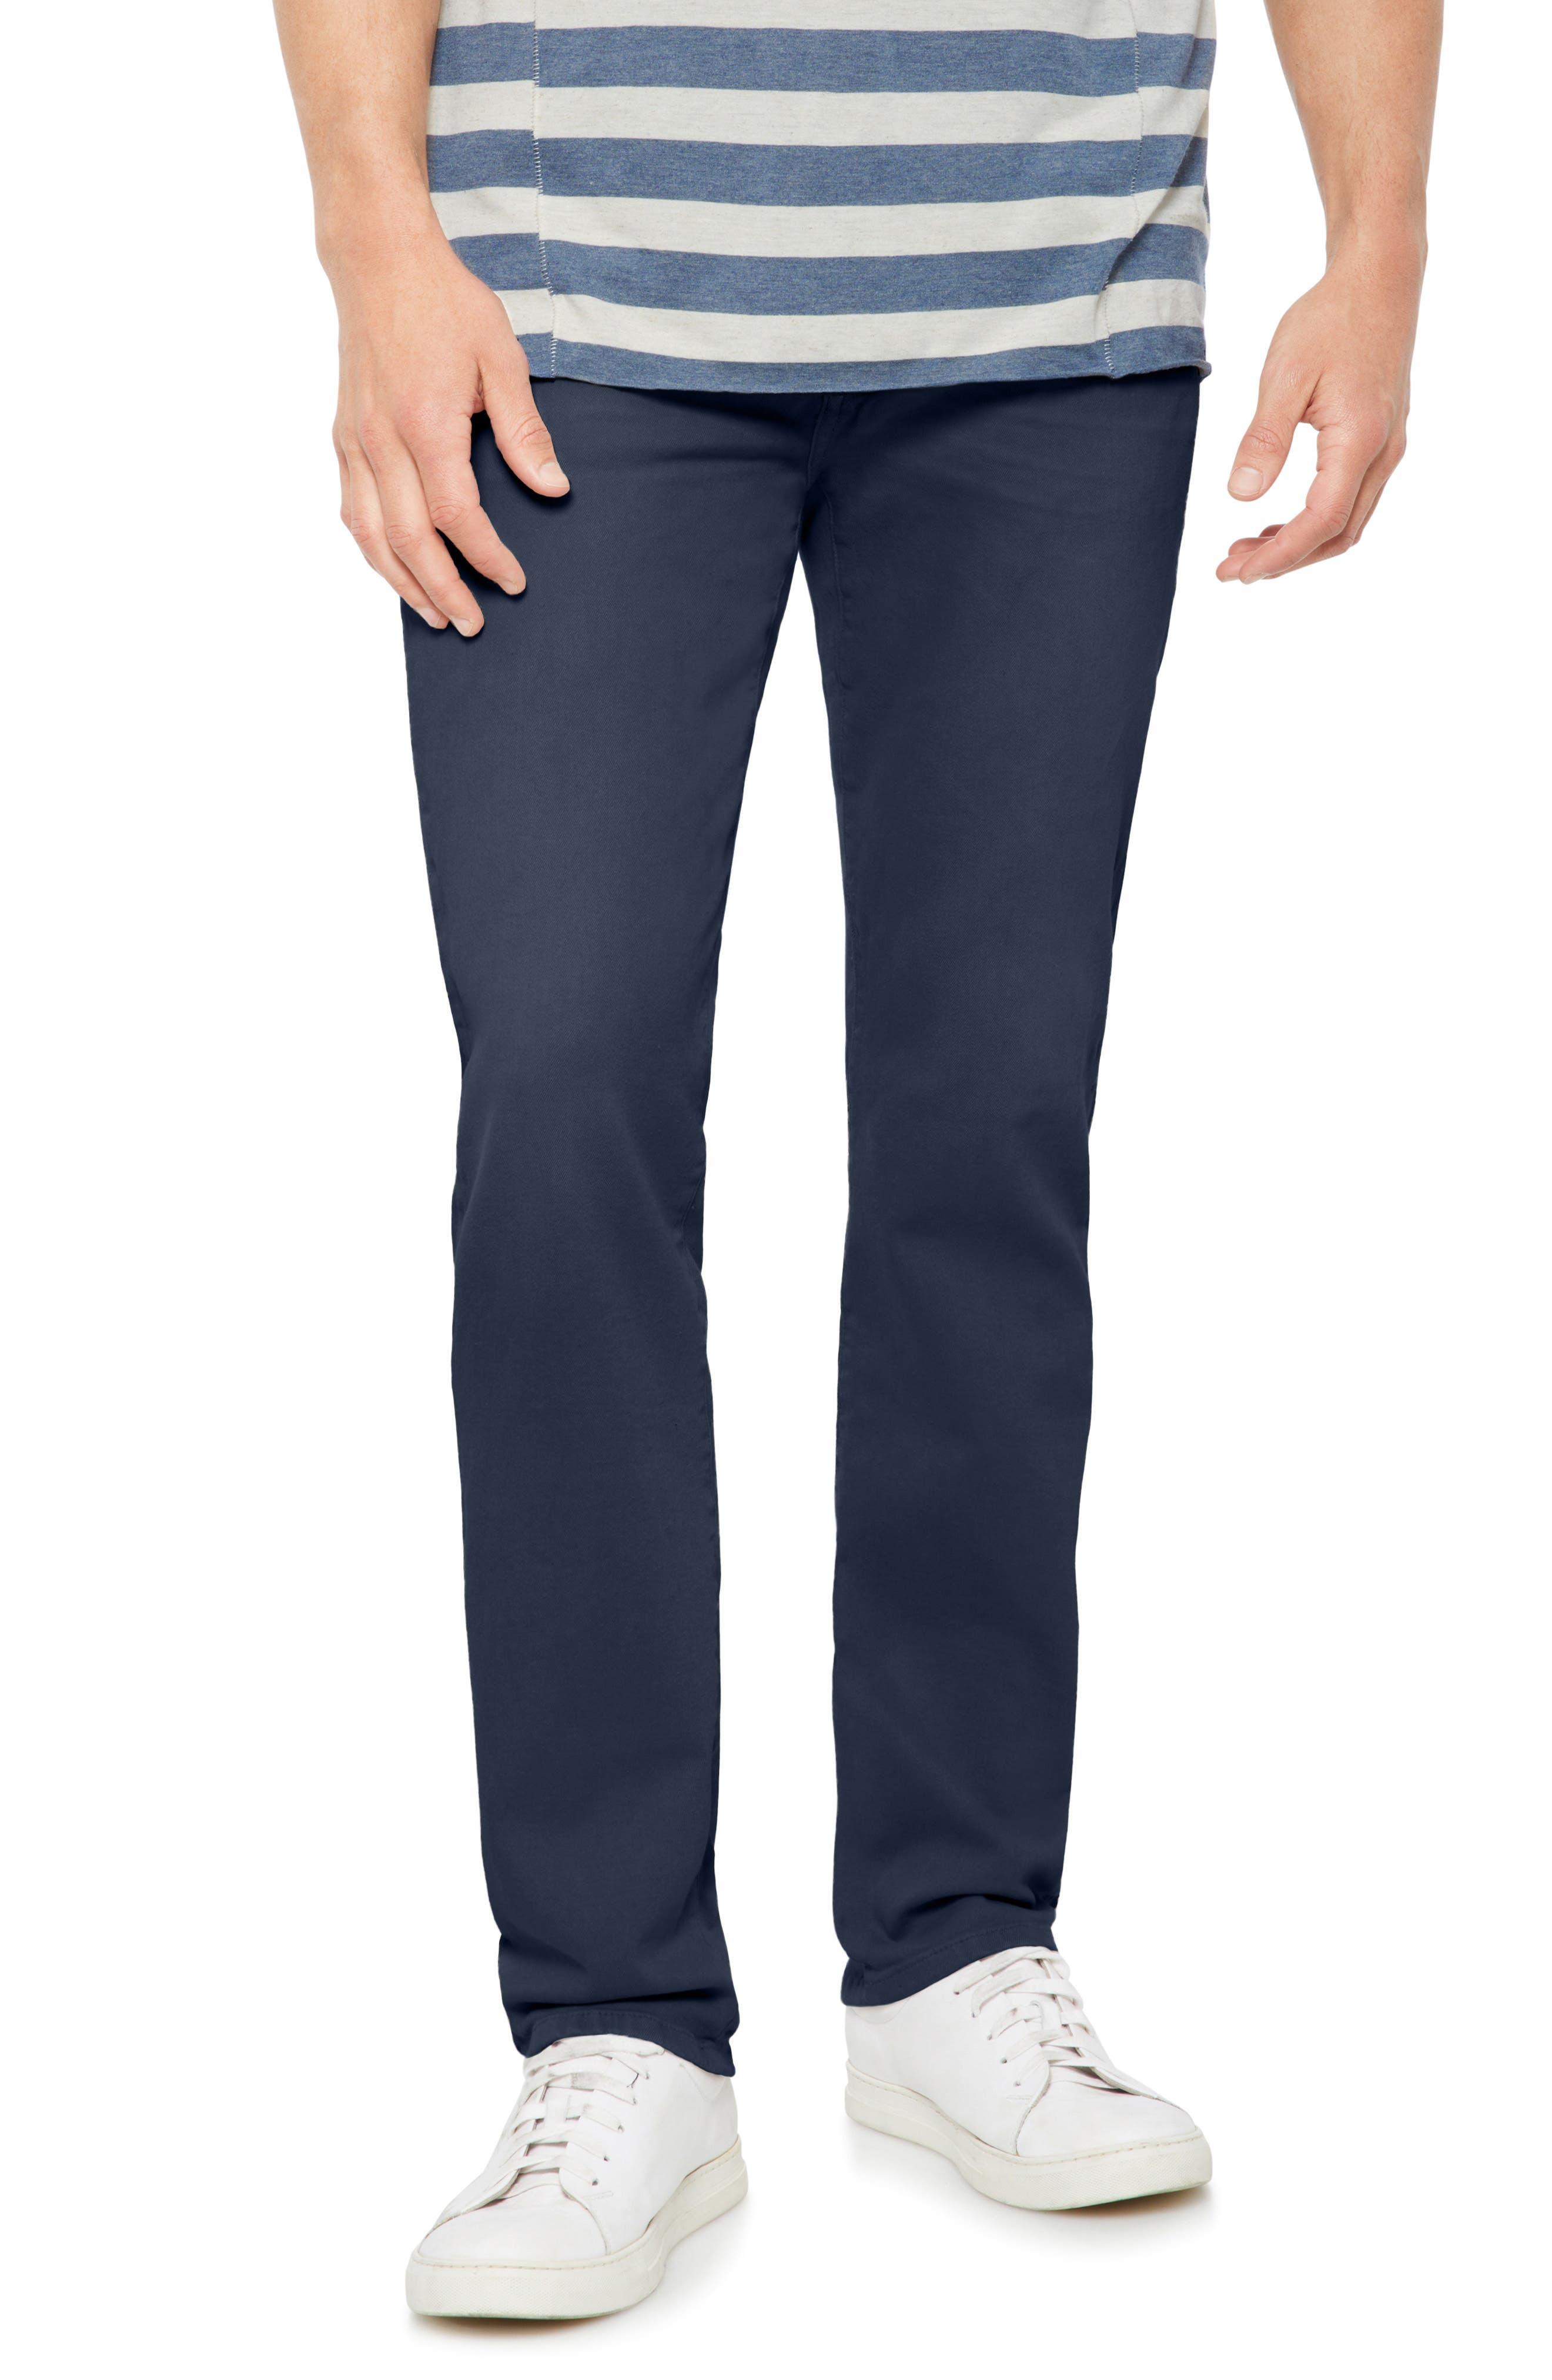 Brixton Slim Straight Leg Jeans,                             Main thumbnail 1, color,                             Navy